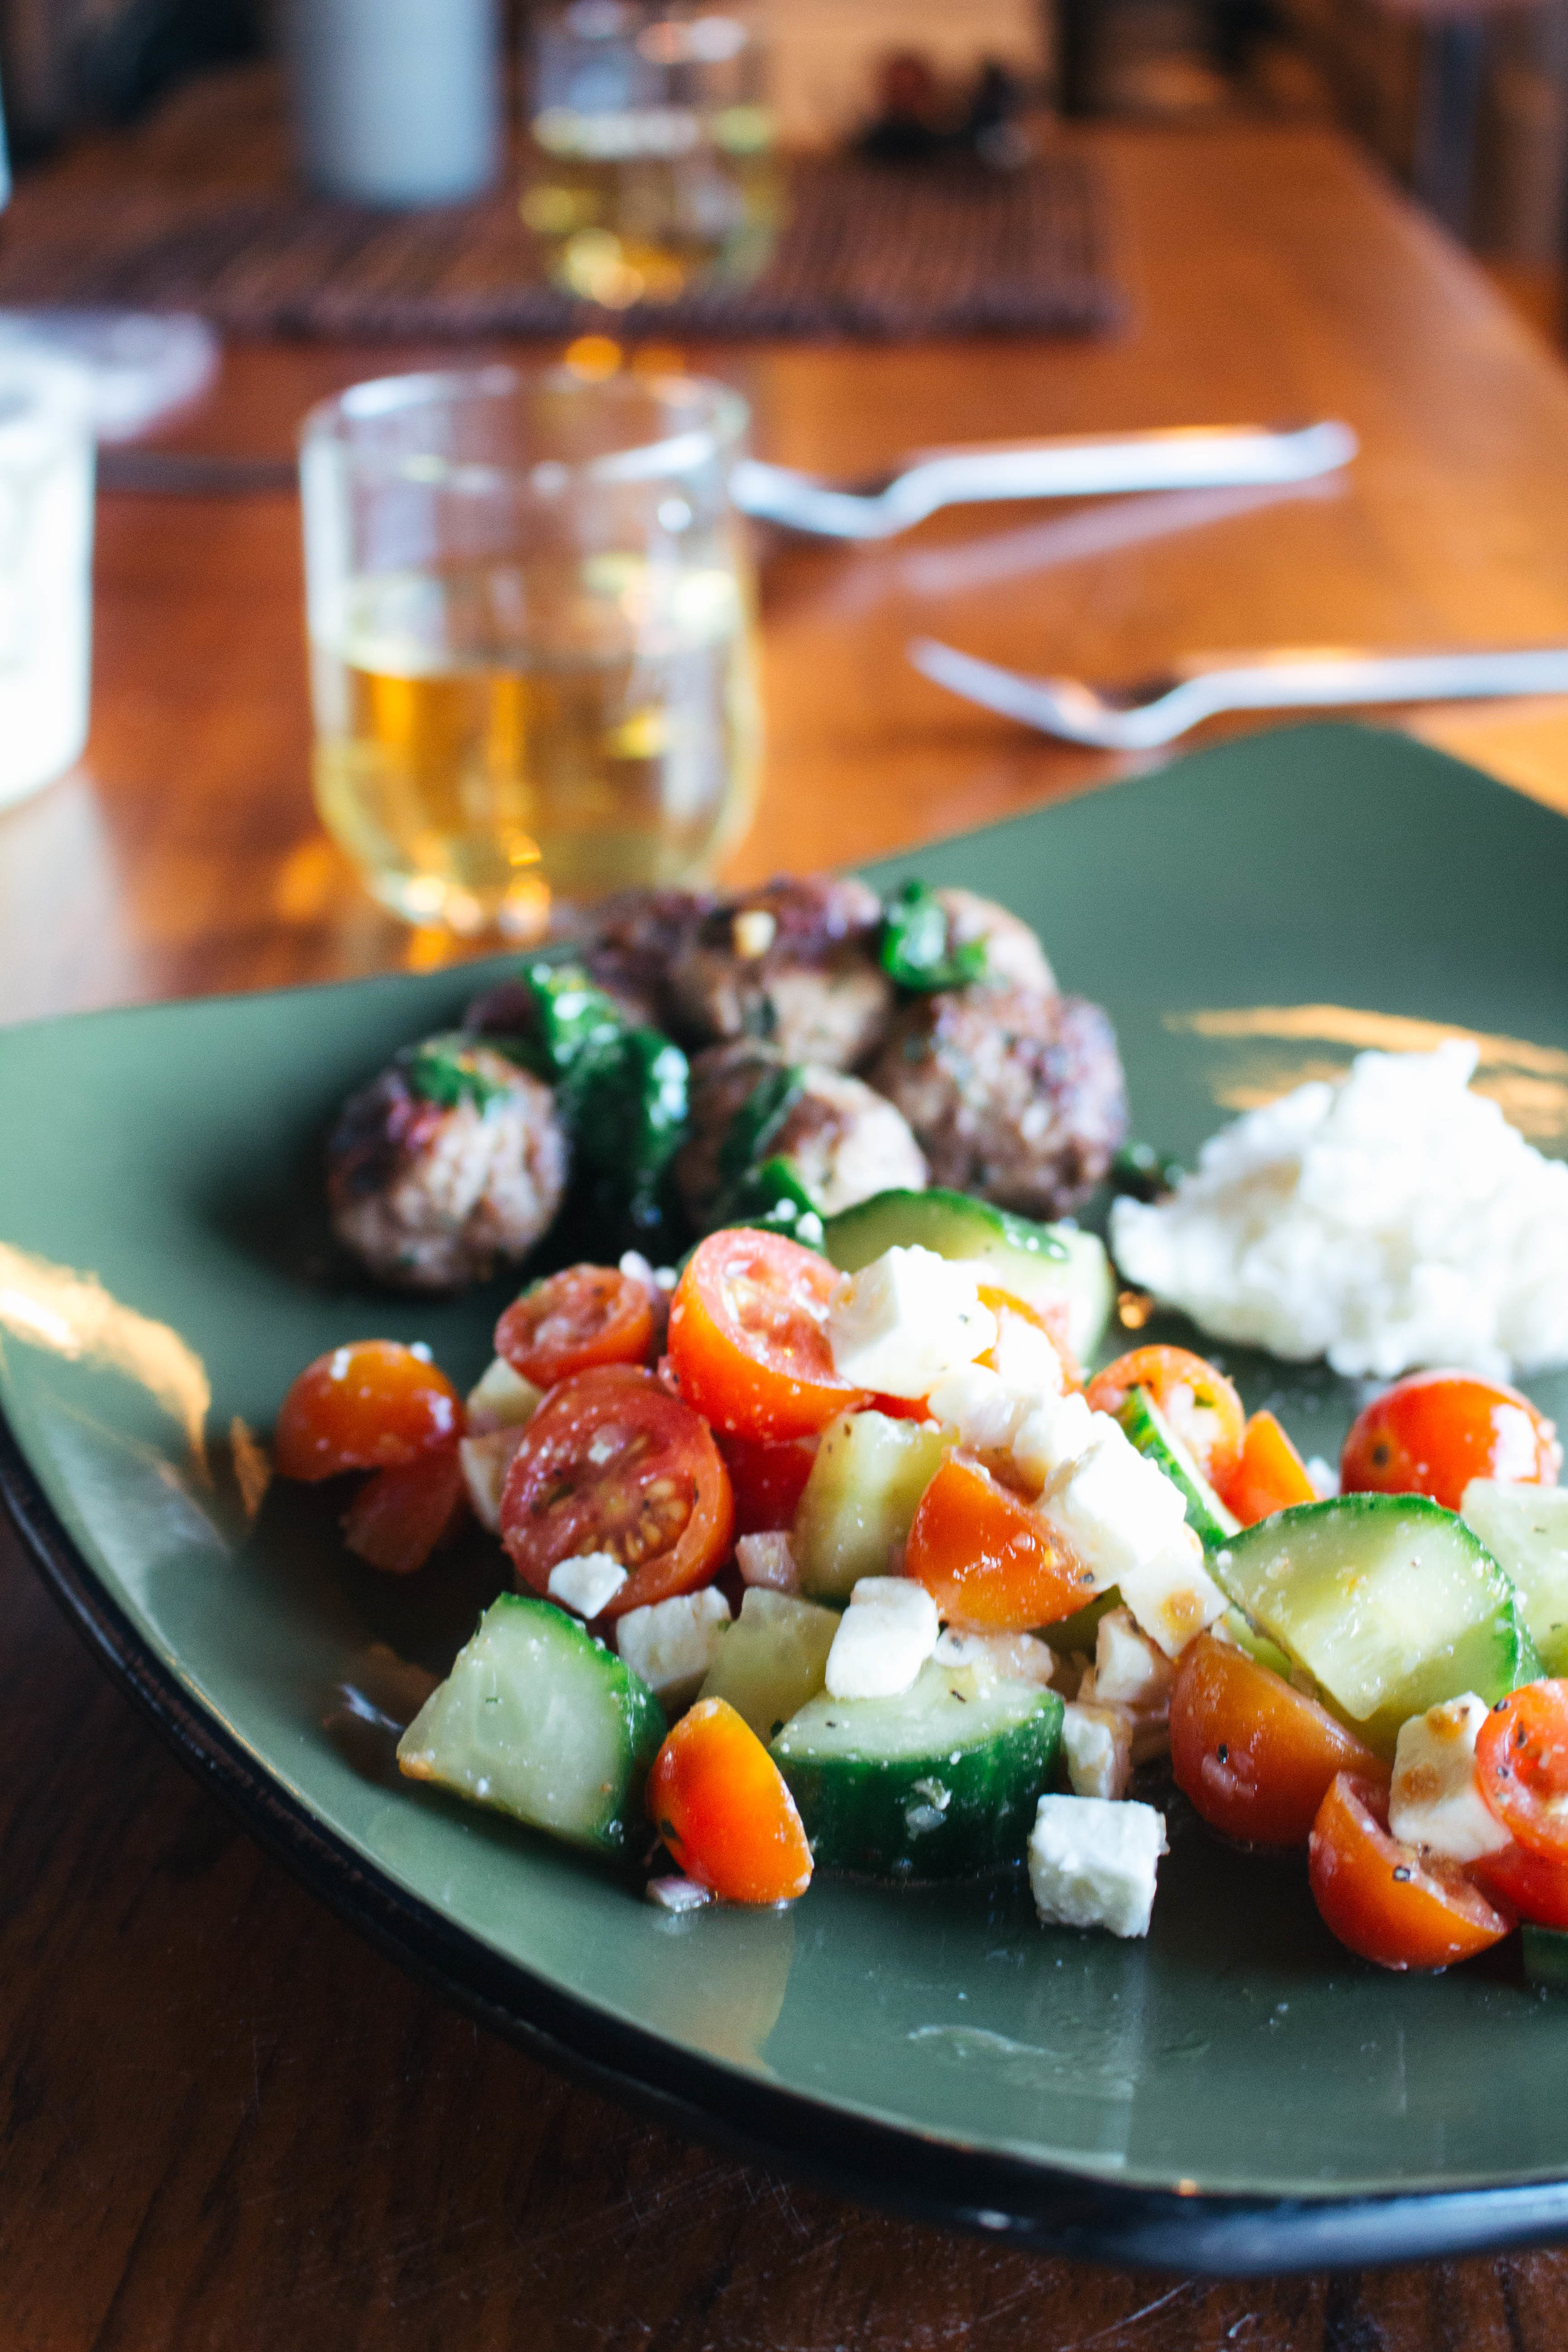 Cucumber Tomato Salad with Feta